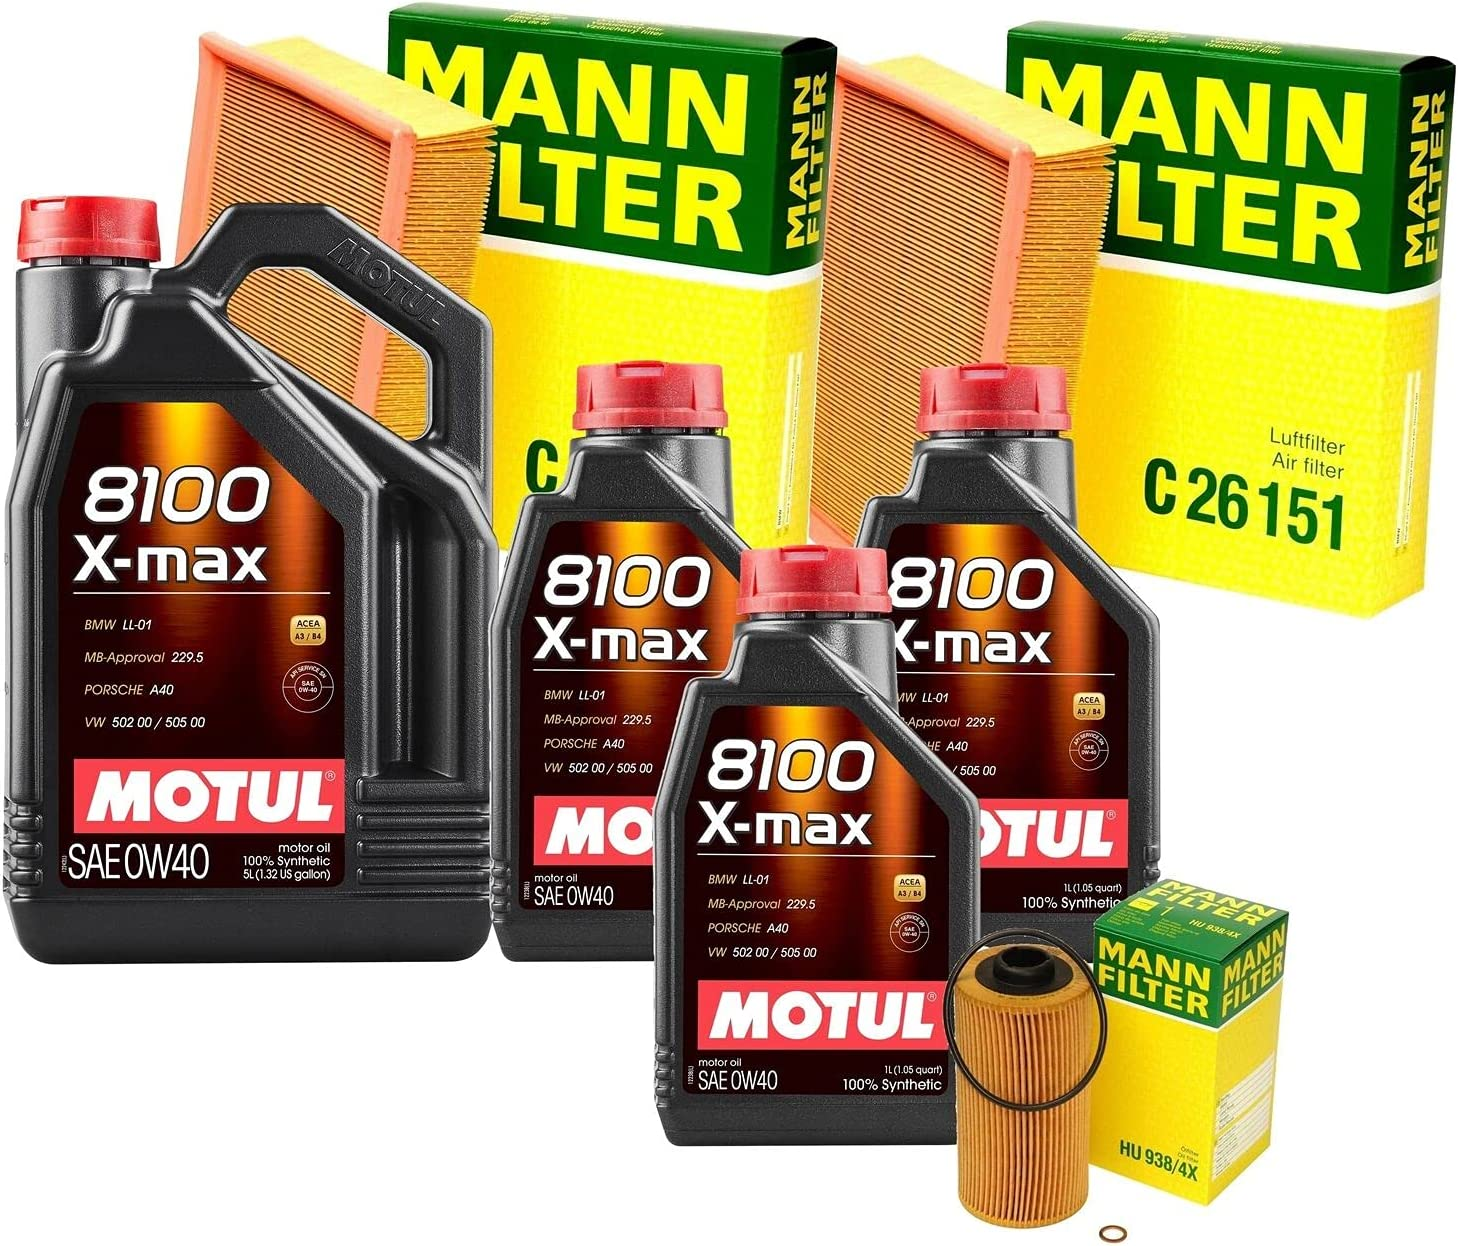 8L 8100 X-MAX 0W-40 Filter Motor favorite Air 4.0 Change Department store 740i Oil kit E38